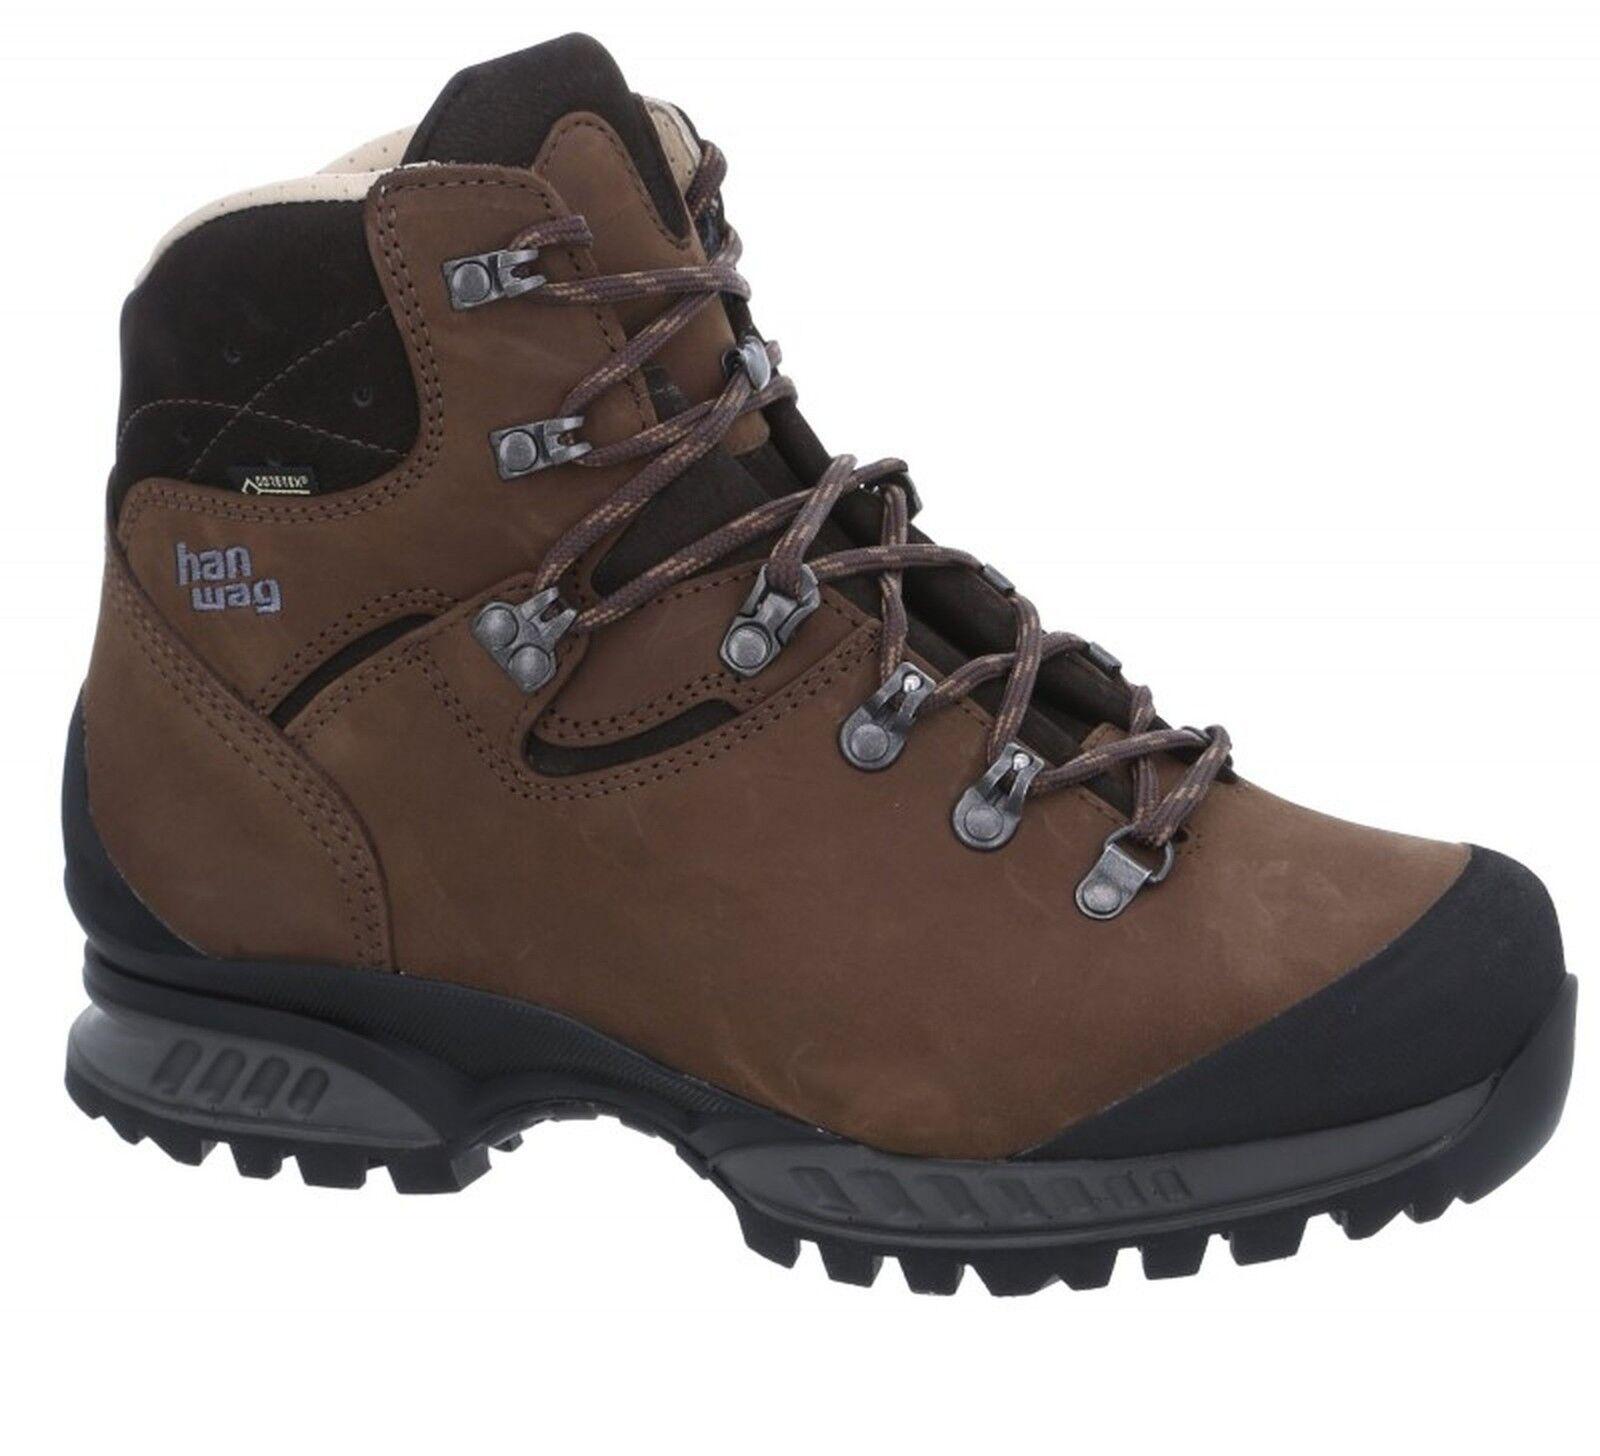 Hanwag trekking zapatos Tatra II Wide cuero tamaño 12-tierra 47